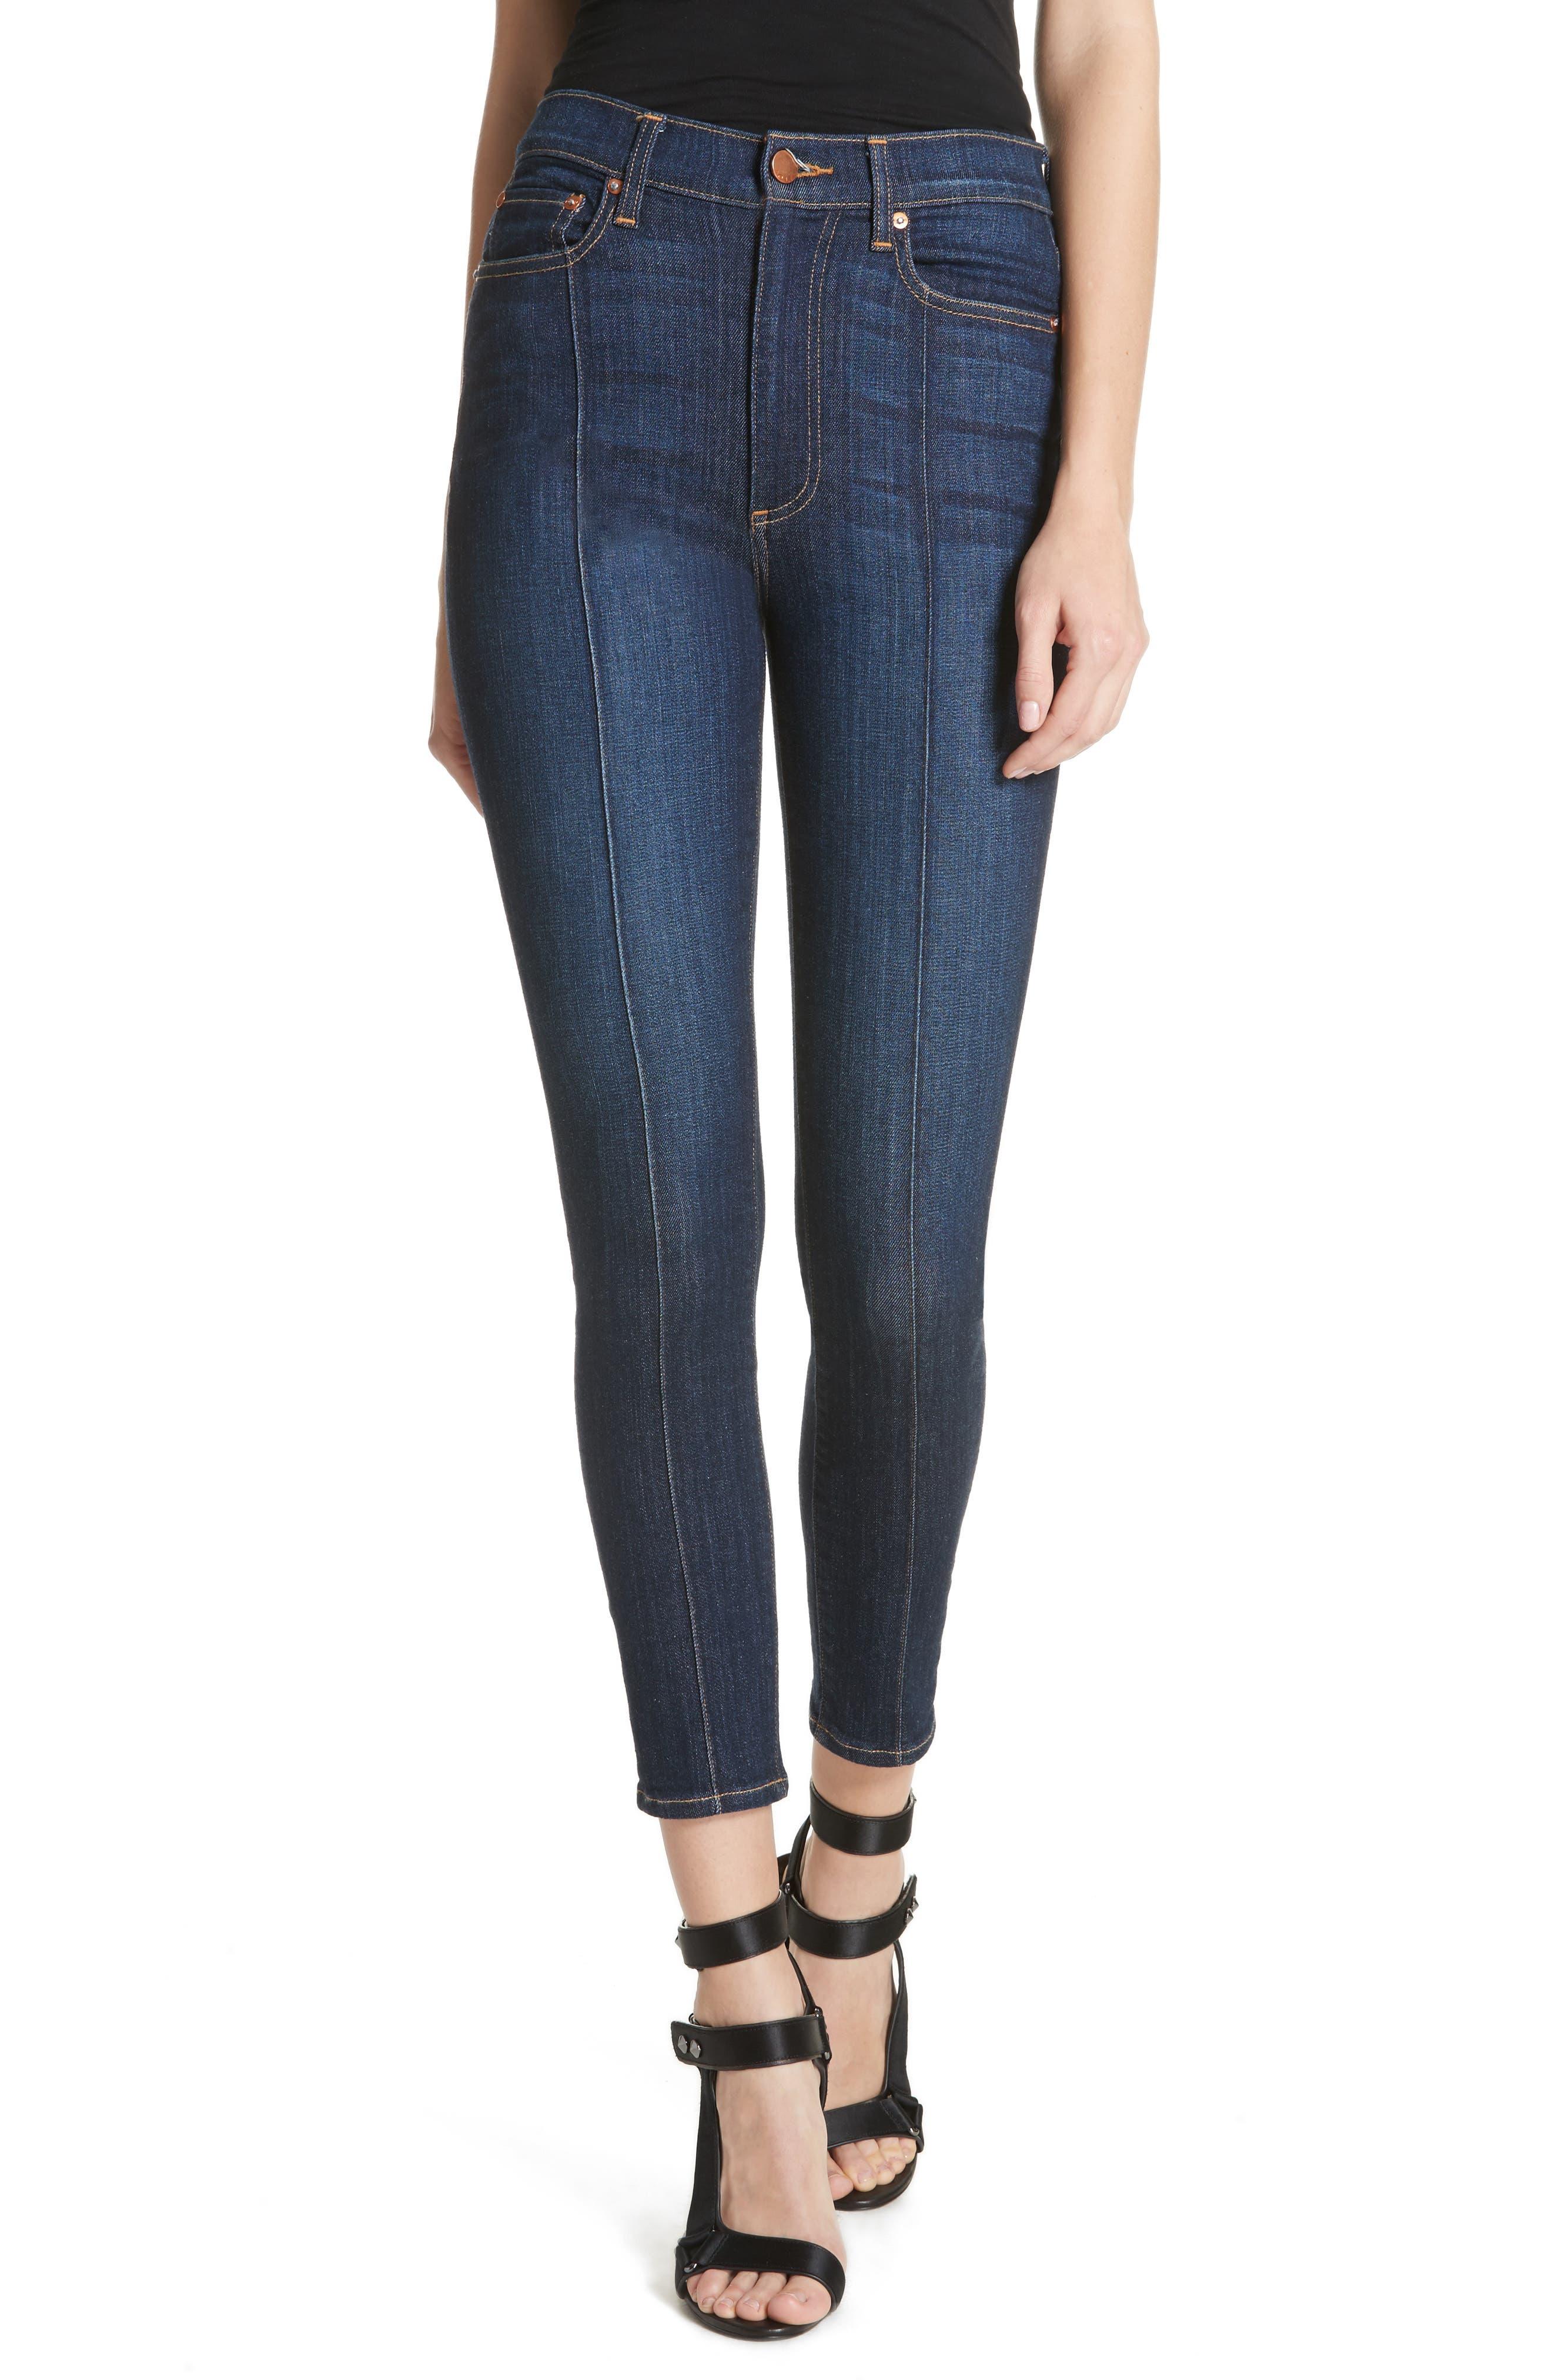 AO.LA Good High Waist Pintuck Skinny Jeans,                         Main,                         color, Dream On